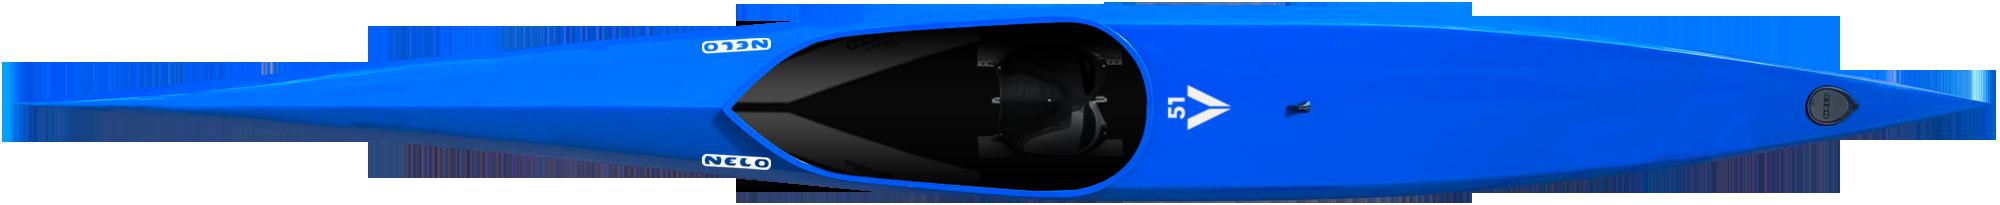 Nelo Viper 51 kayak